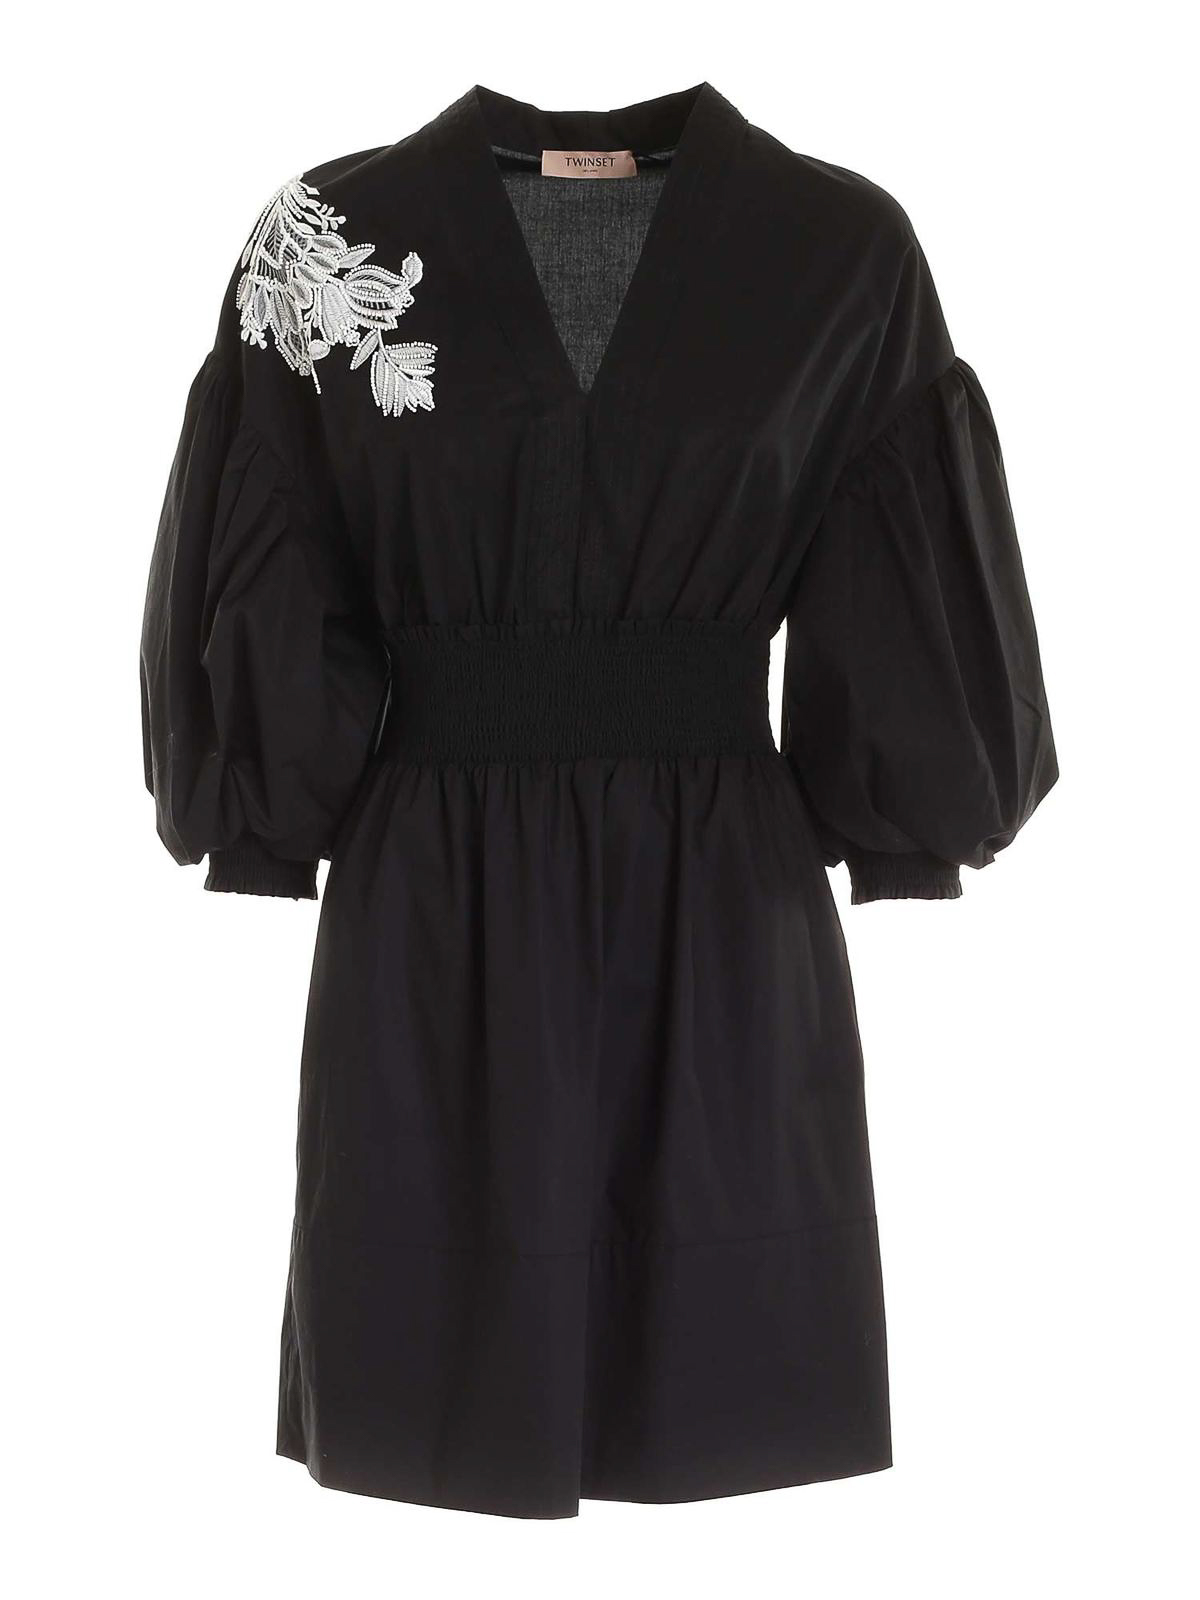 Twinset Cottons POPLIN KIMONO-STYLE DRESS